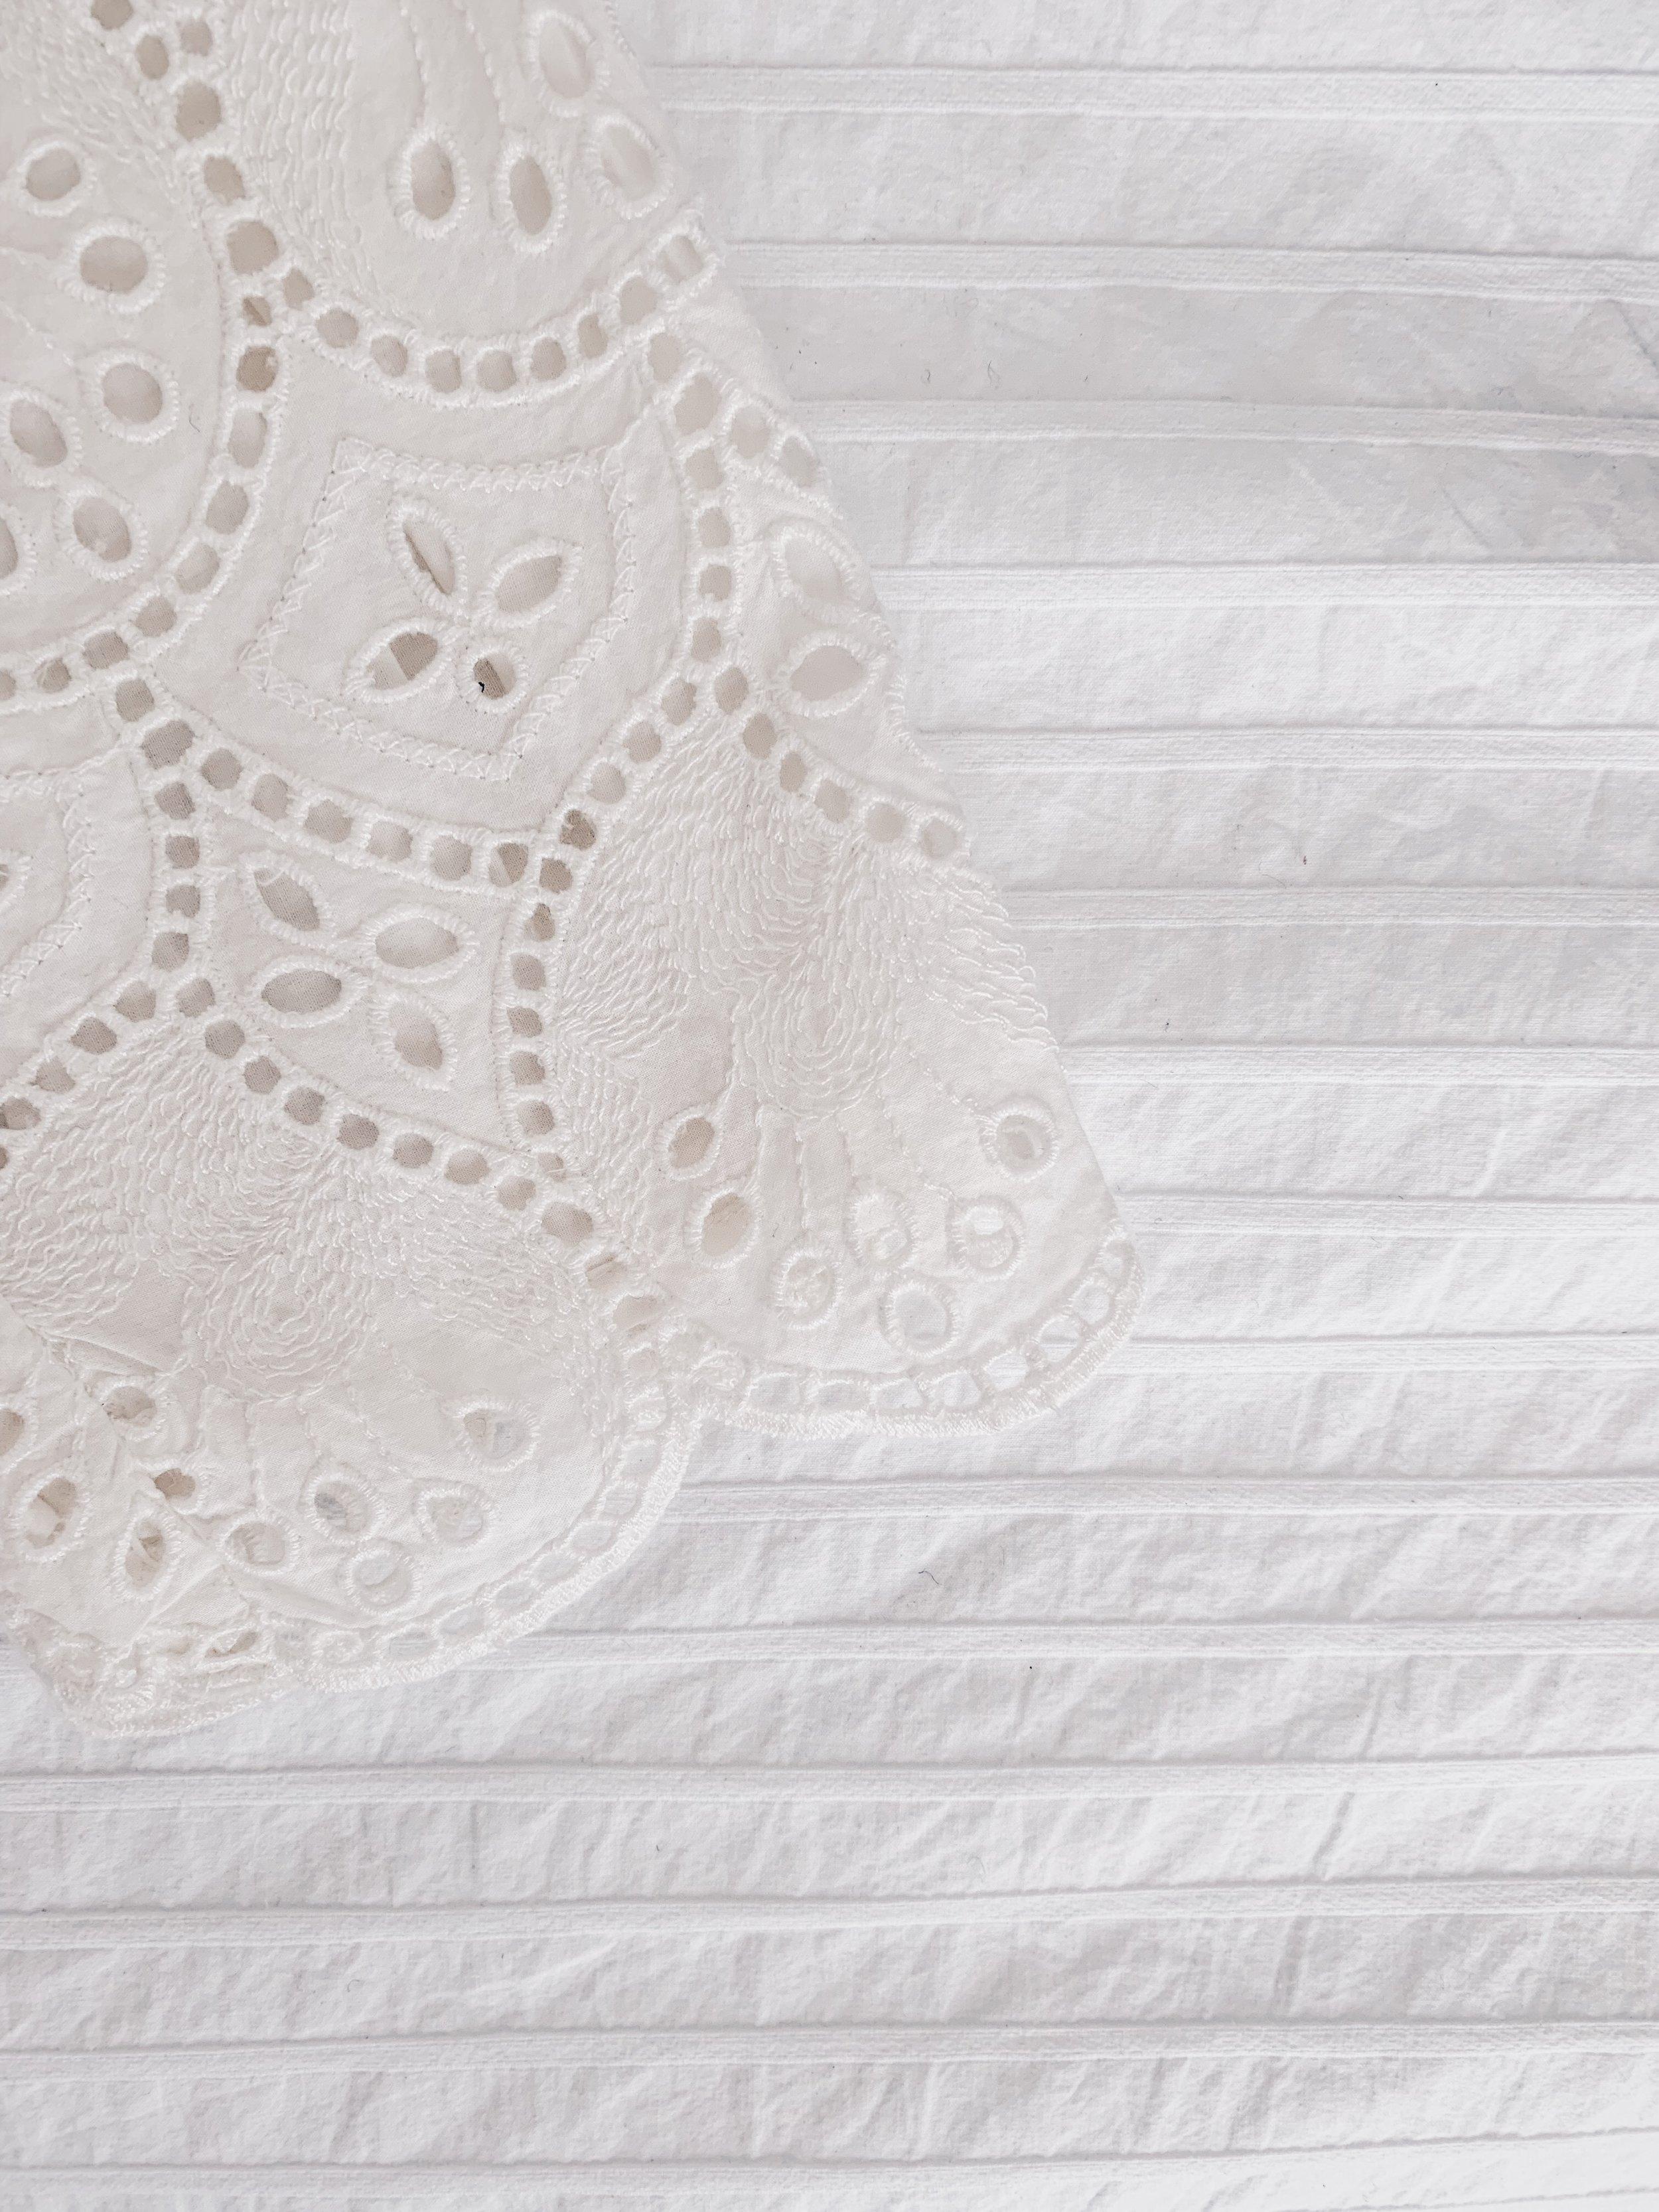 The Attic On Eighth Our Uniform Eyelet Cotton Fashion Olivia Gunduz Willemin 3.JPG